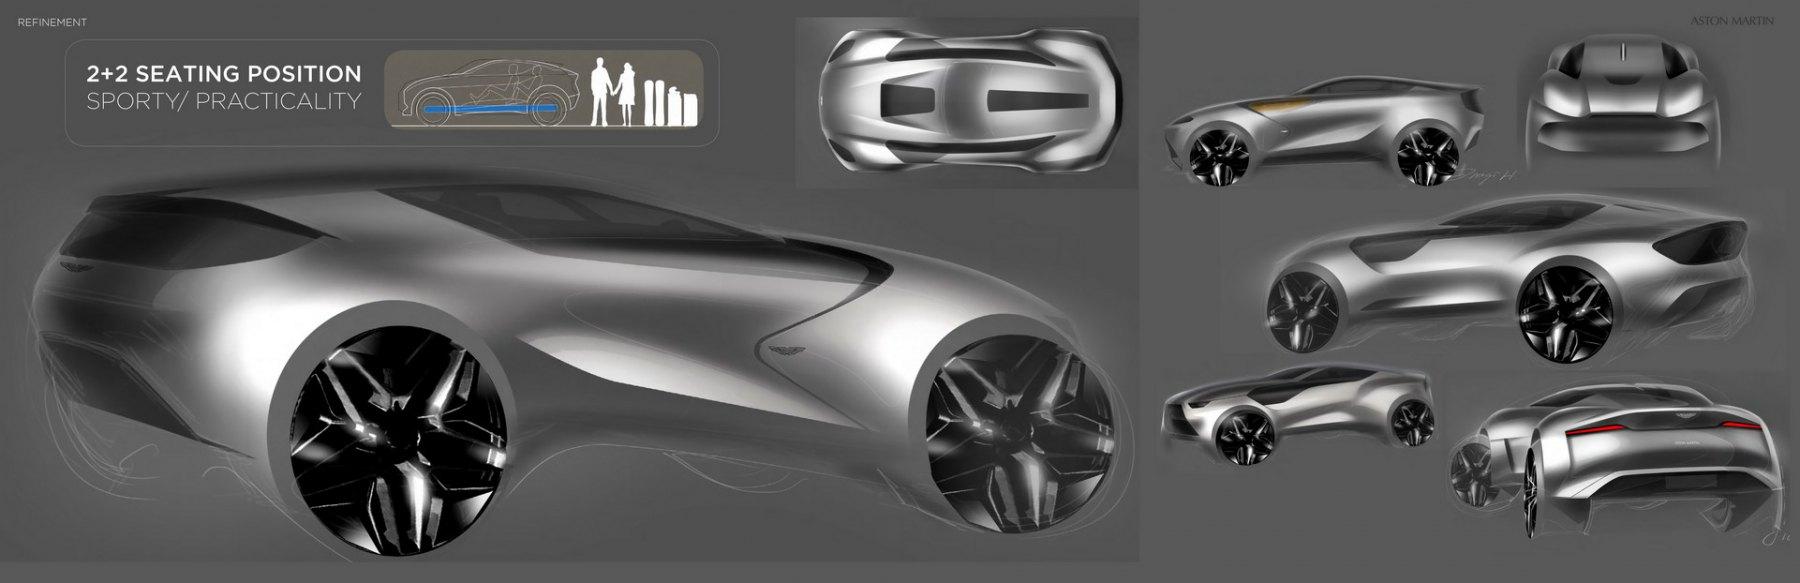 Aston Martin SUV 2030 - Render